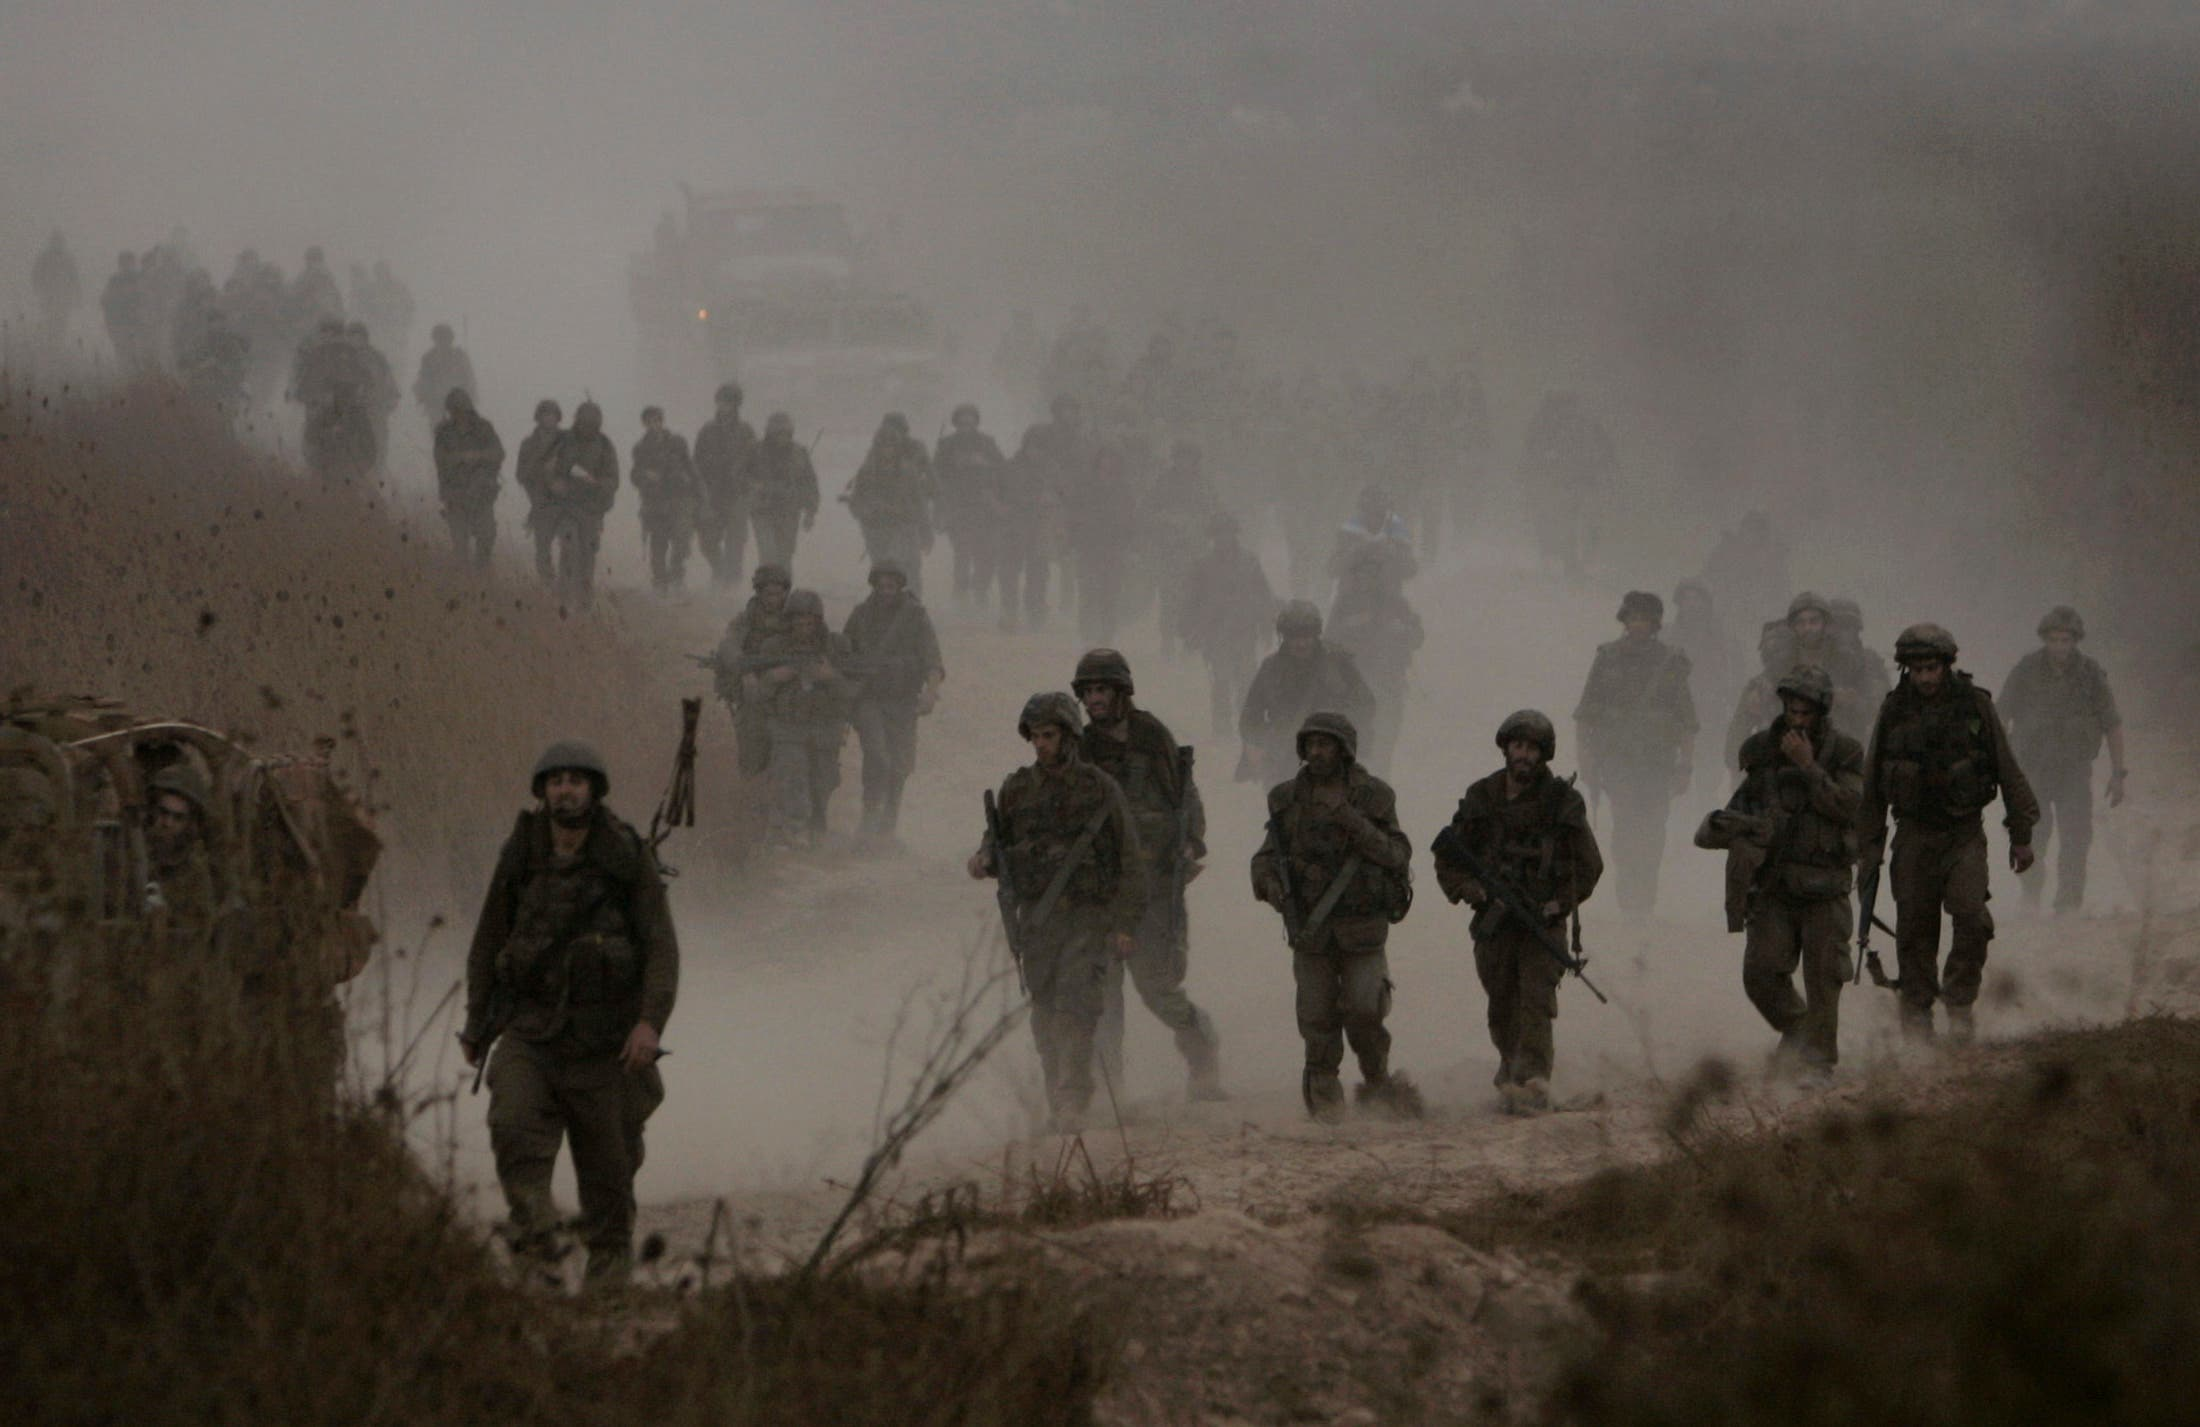 Israeli soldiers return from Lebanese territory near the northern Israeli town of Menara in this August 15, 2006 Reuters